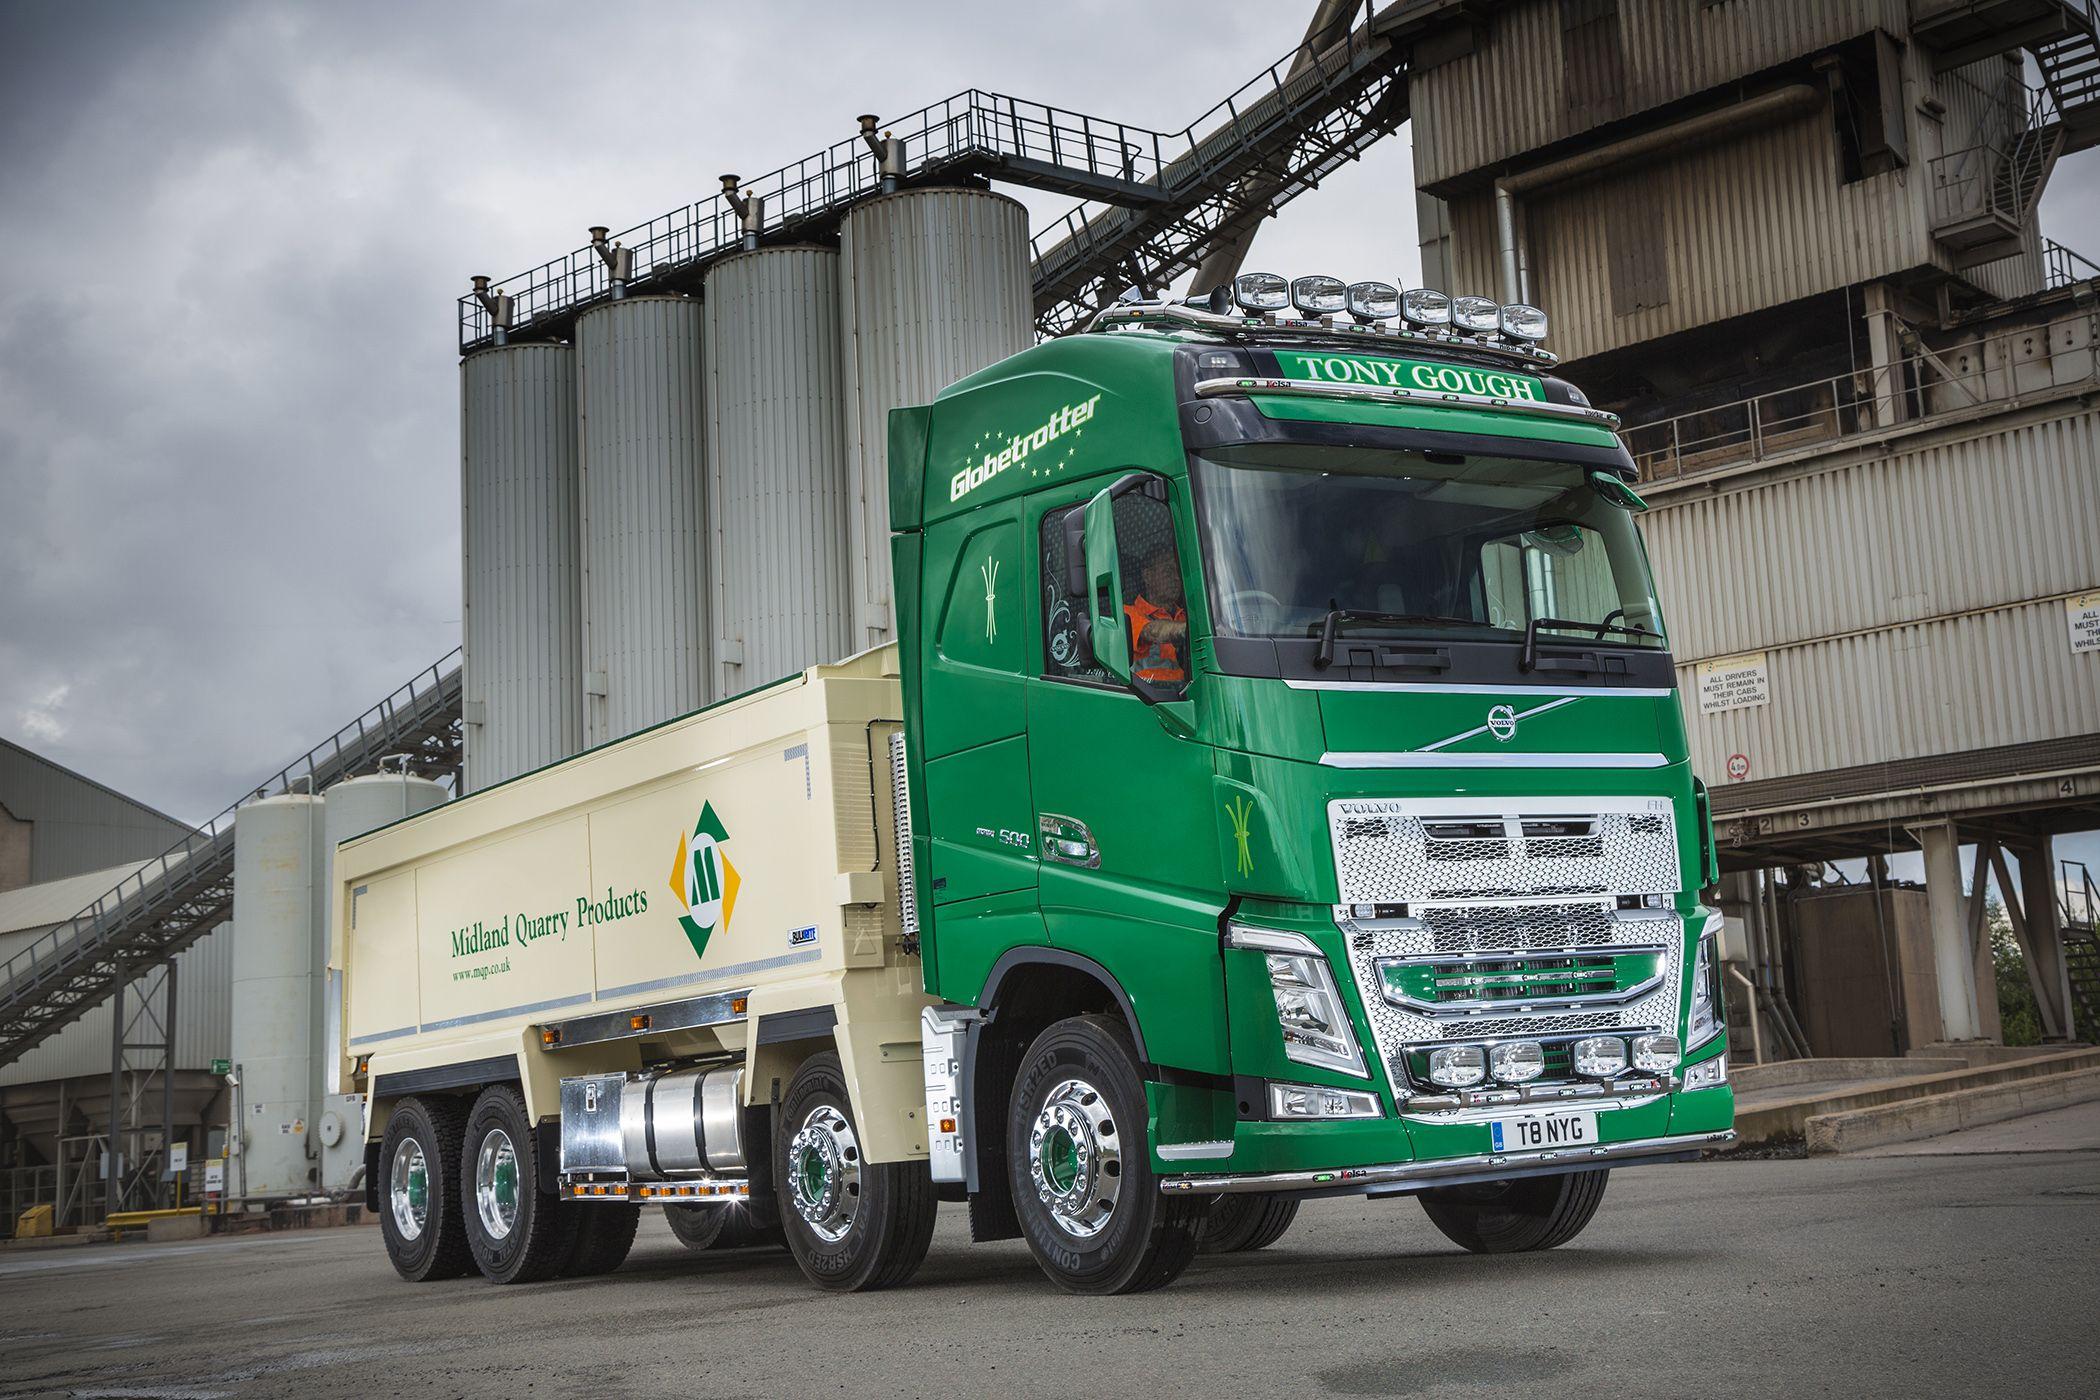 Trucking Volvo trucks, Lorry, Trucks